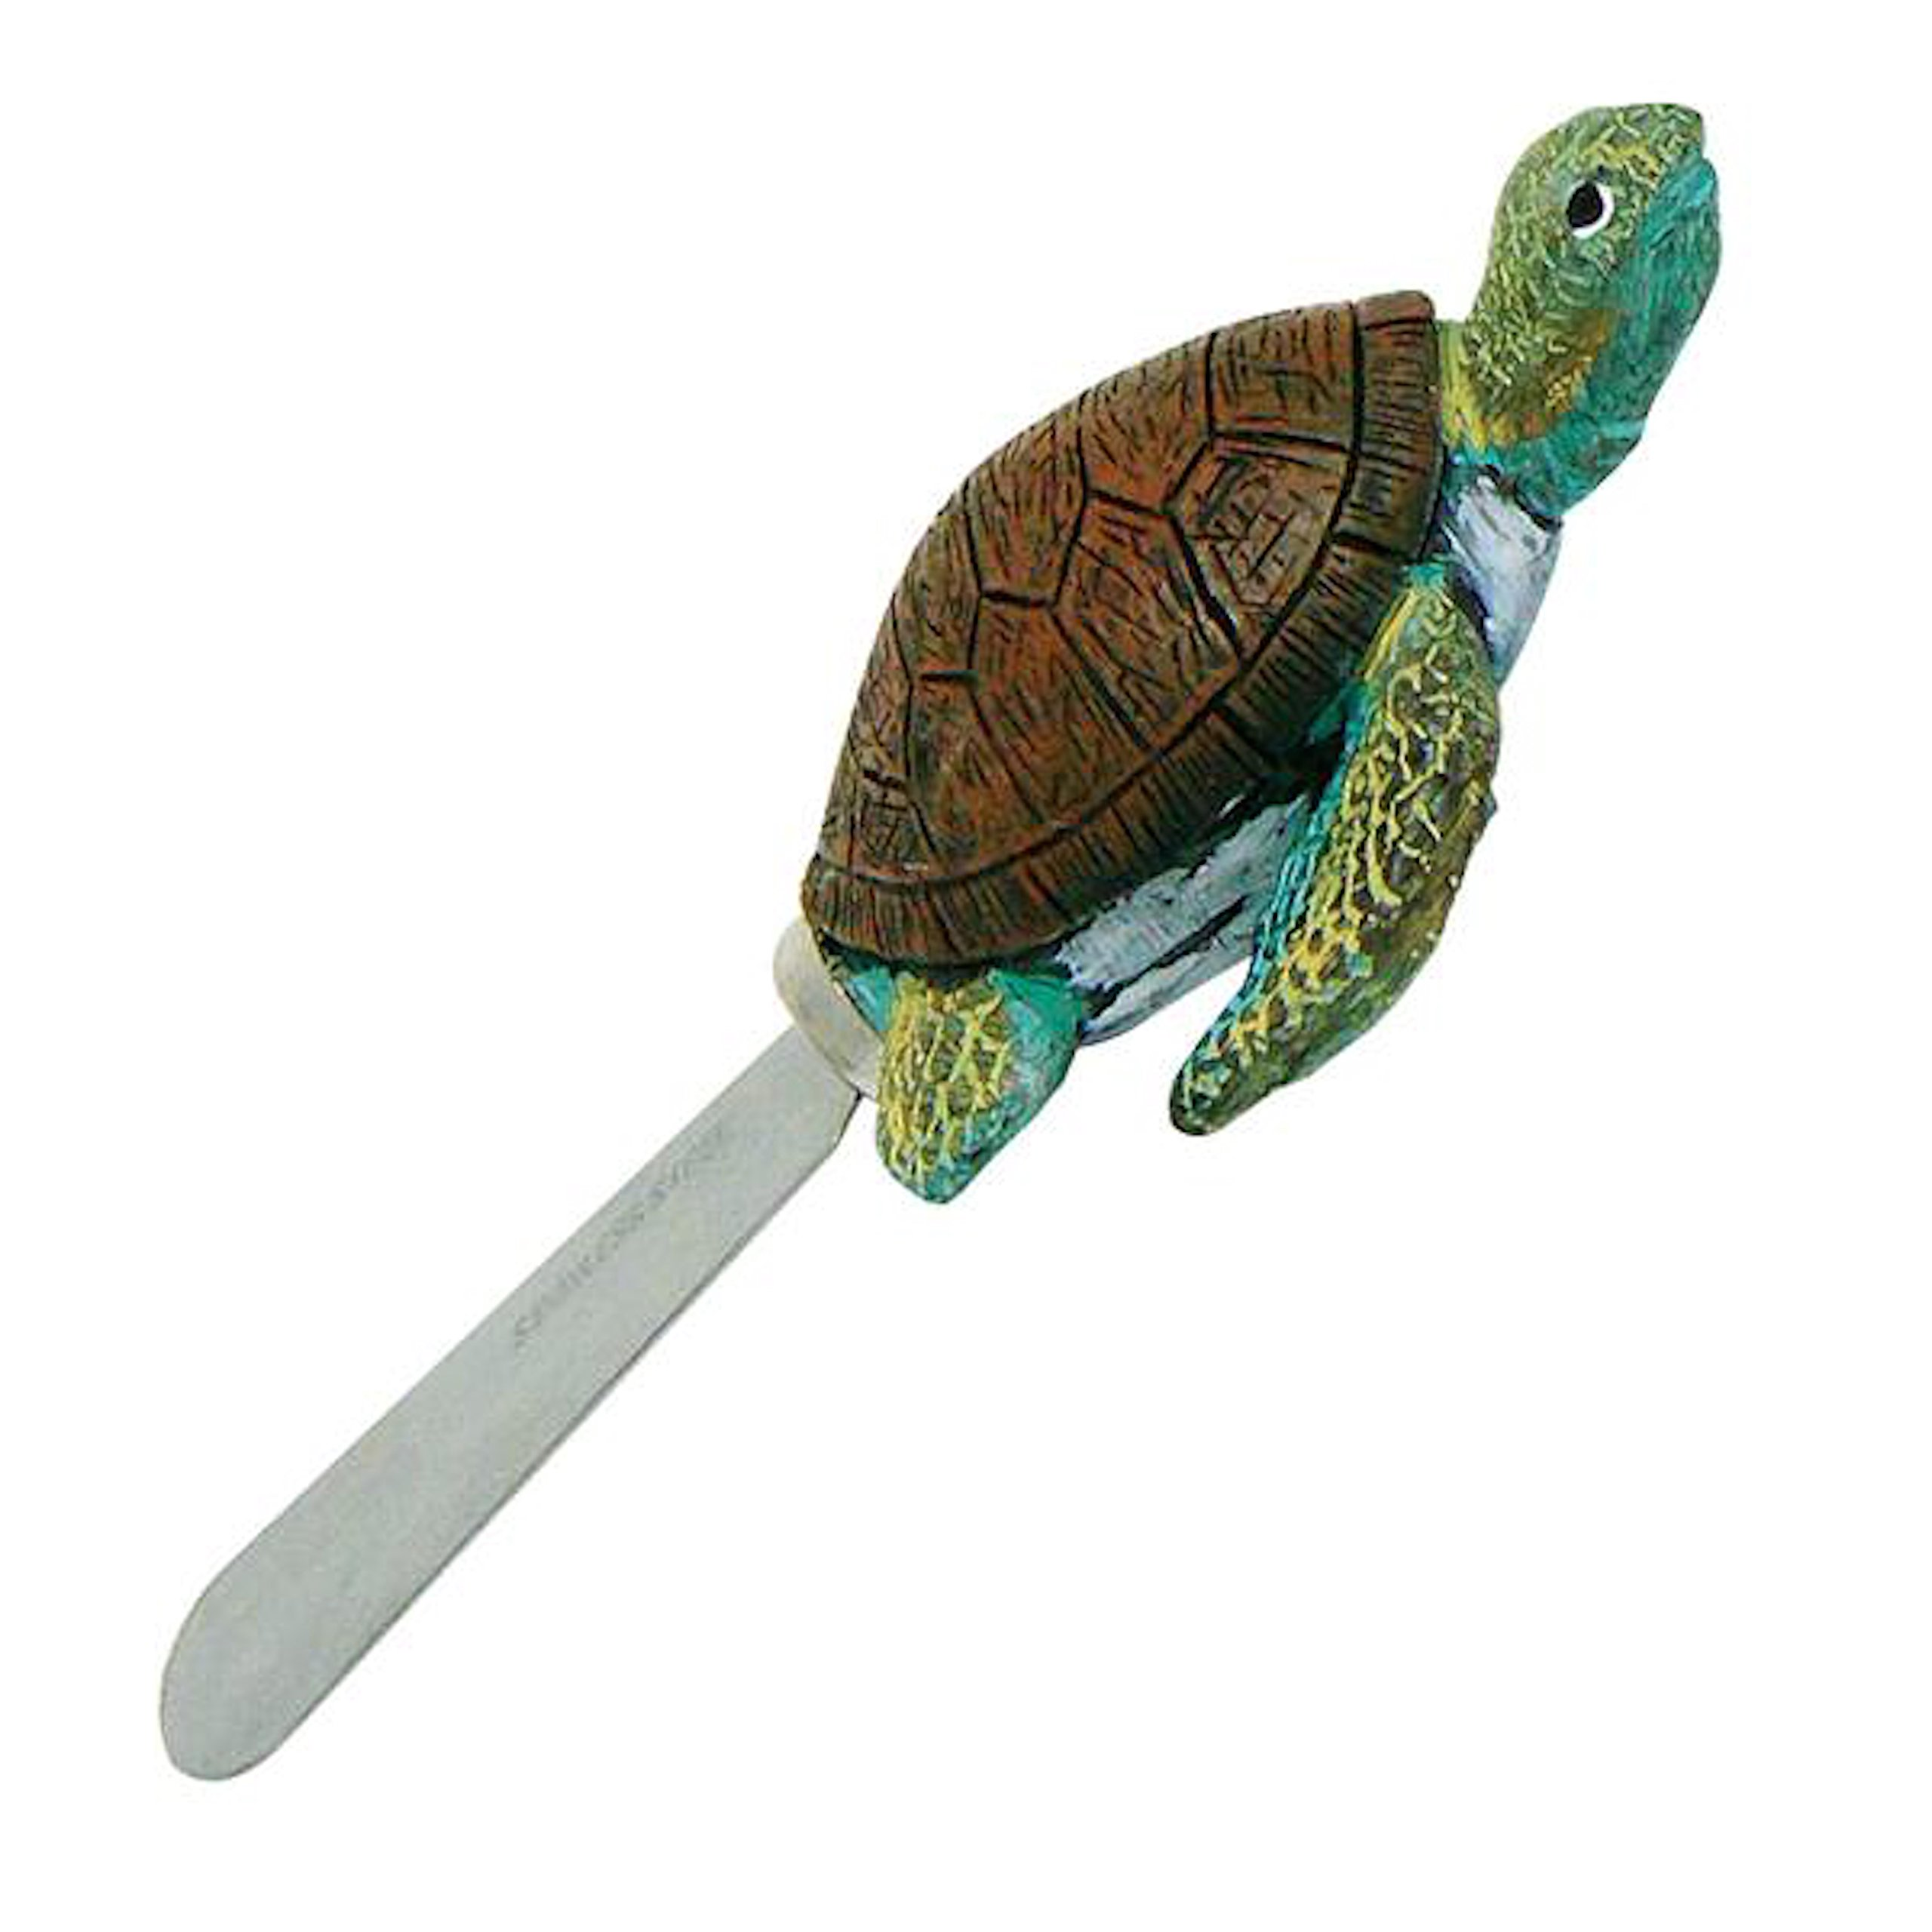 Set Of 4 Sea Turtle Butter Spreader Knives